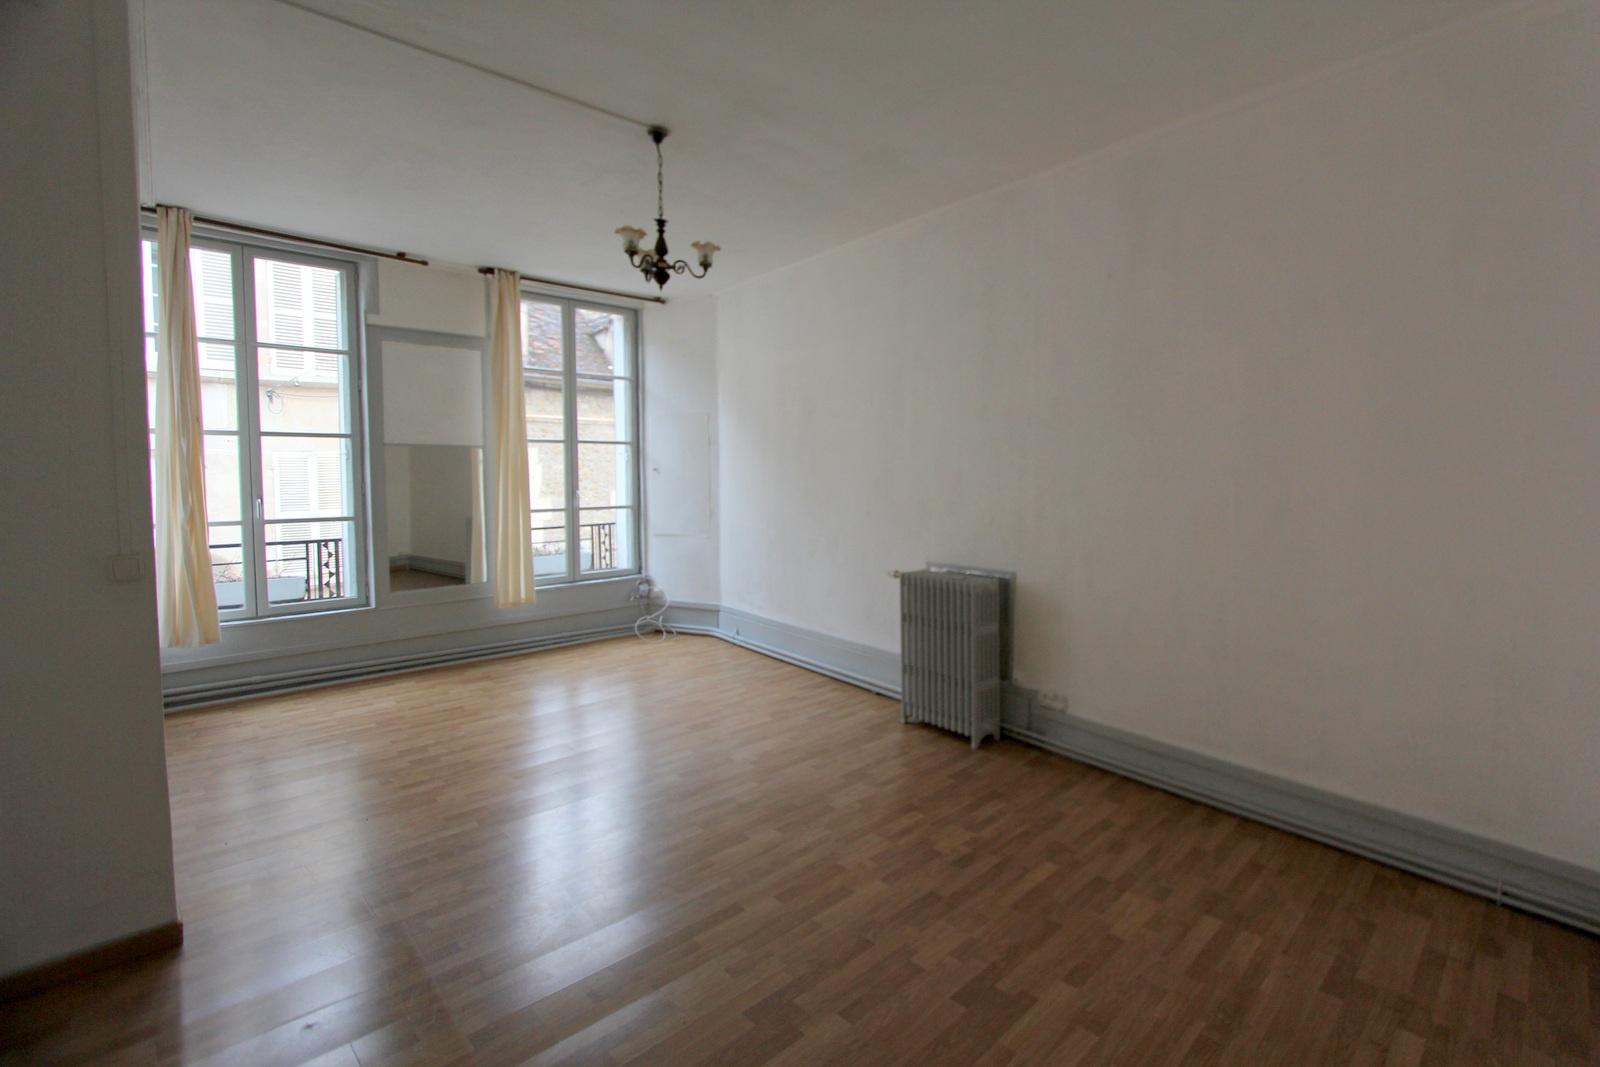 Annonce vente appartement avallon 89200 67 m 65 000 992739429241 - Appartement type 3 definition ...